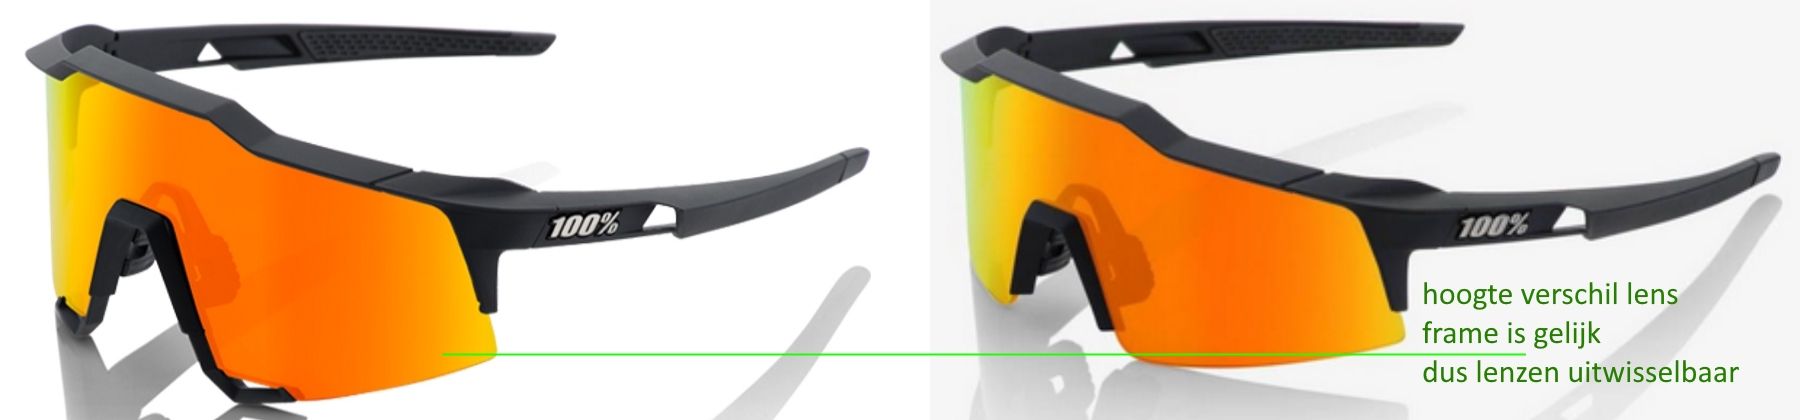 Normale speedcraft (L) fietsbril vs speedcraft SL (R)